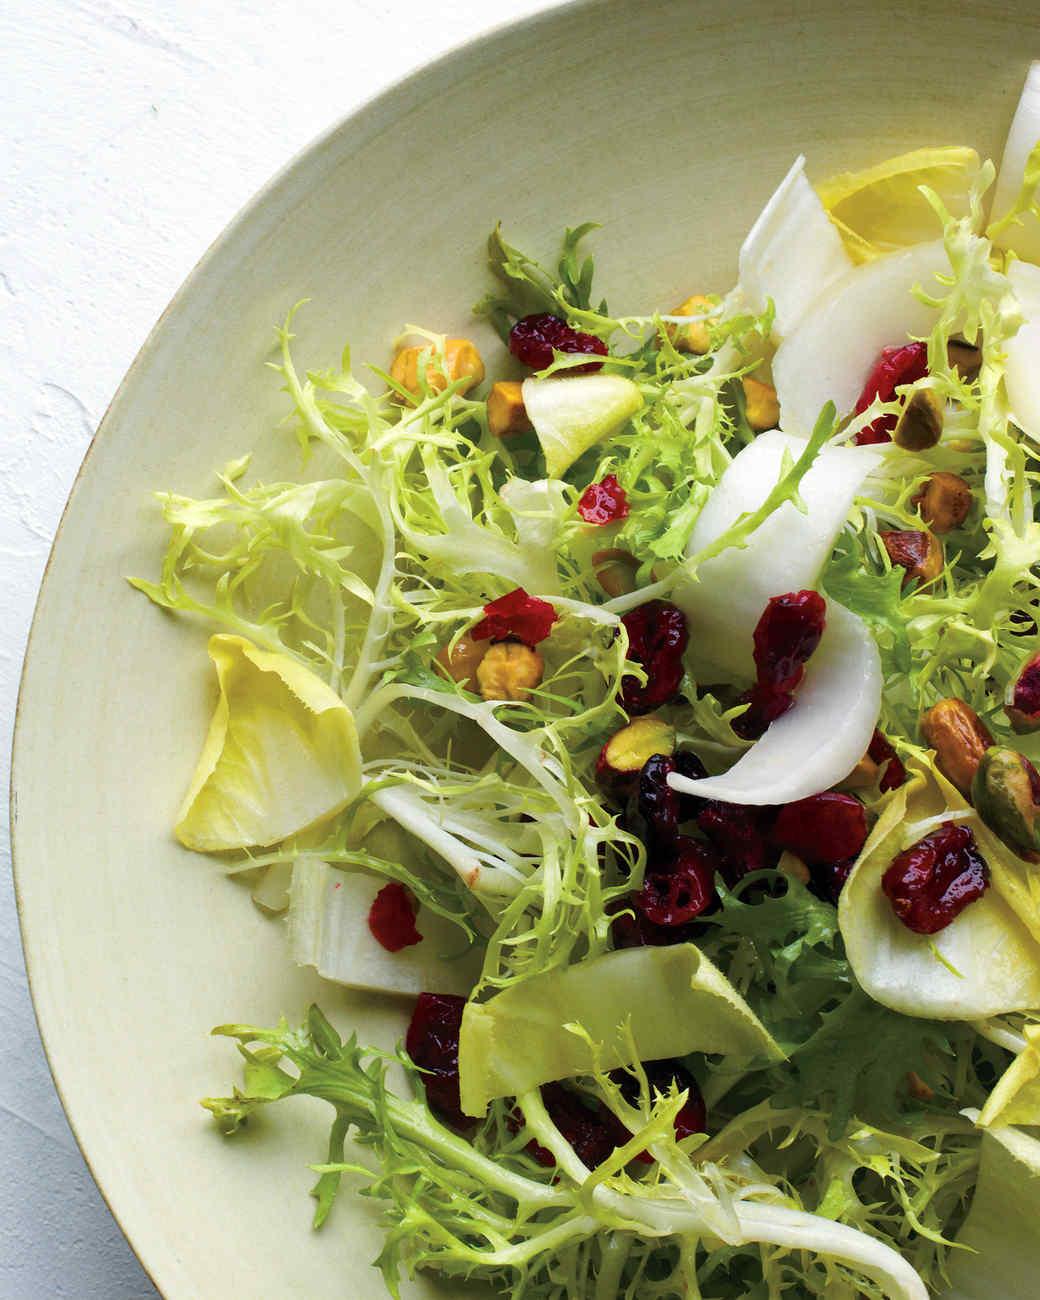 med106155_1110_sid_salad_fennel.jpg